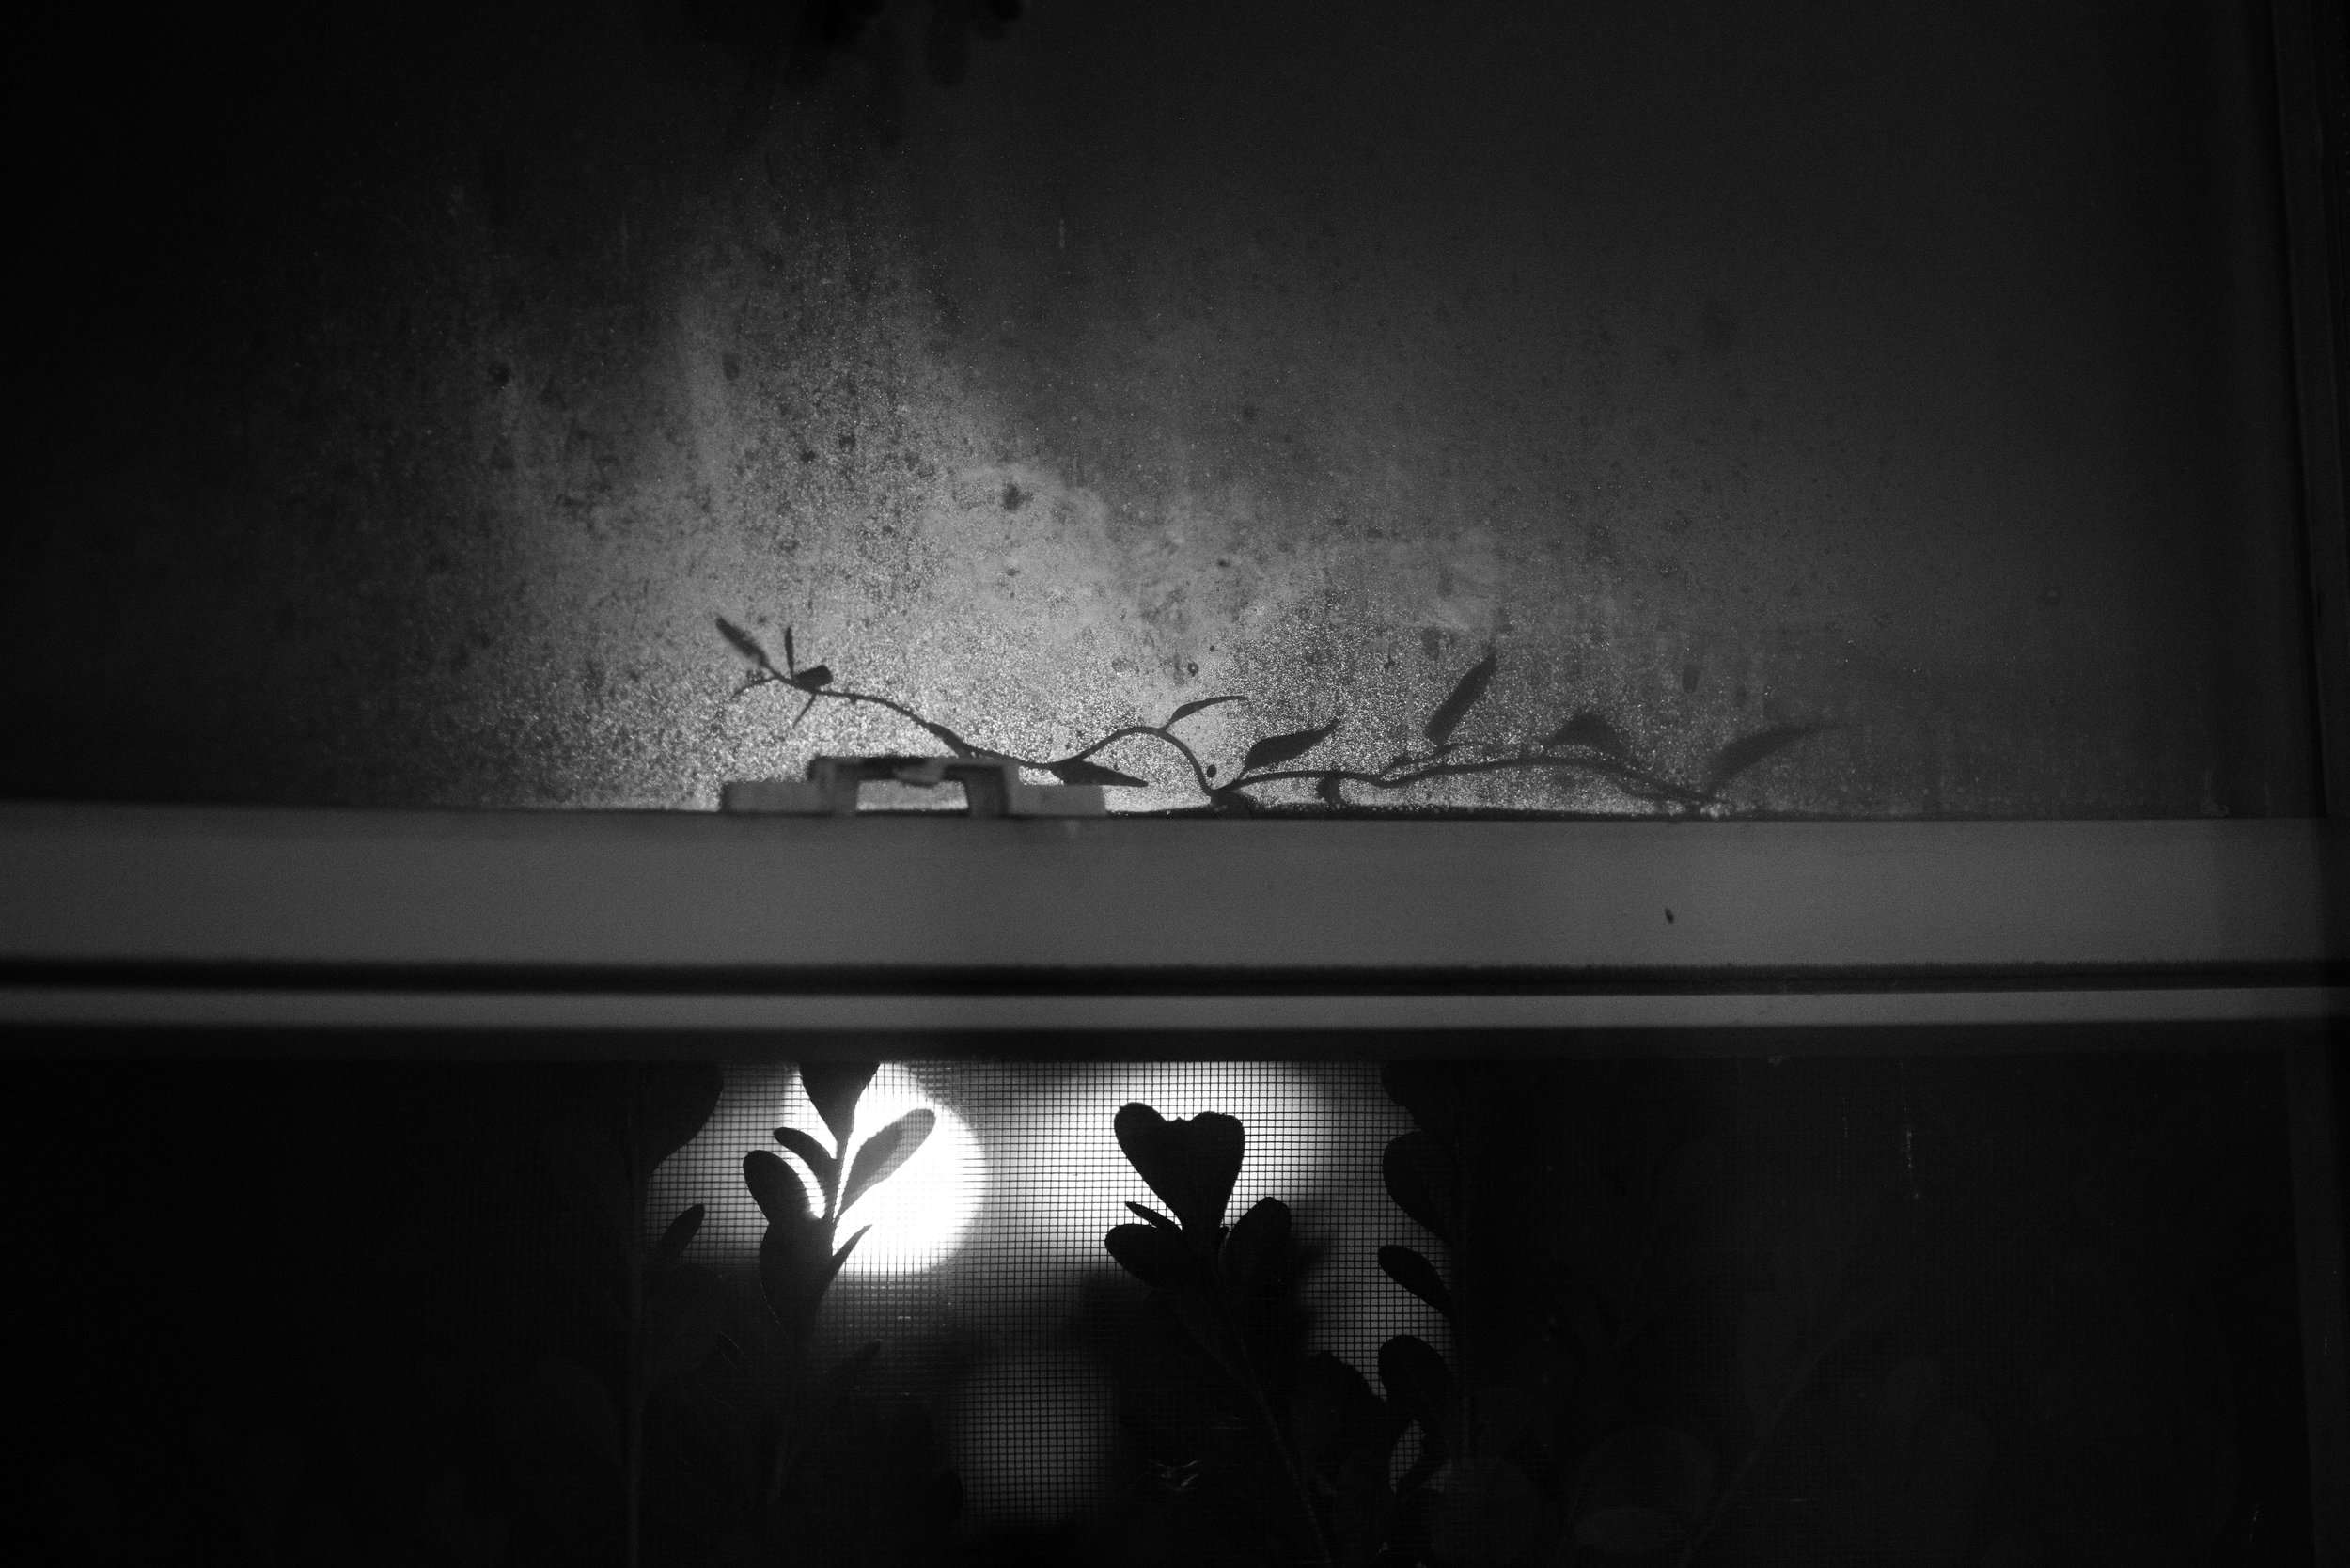 plants_windowsil.jpg